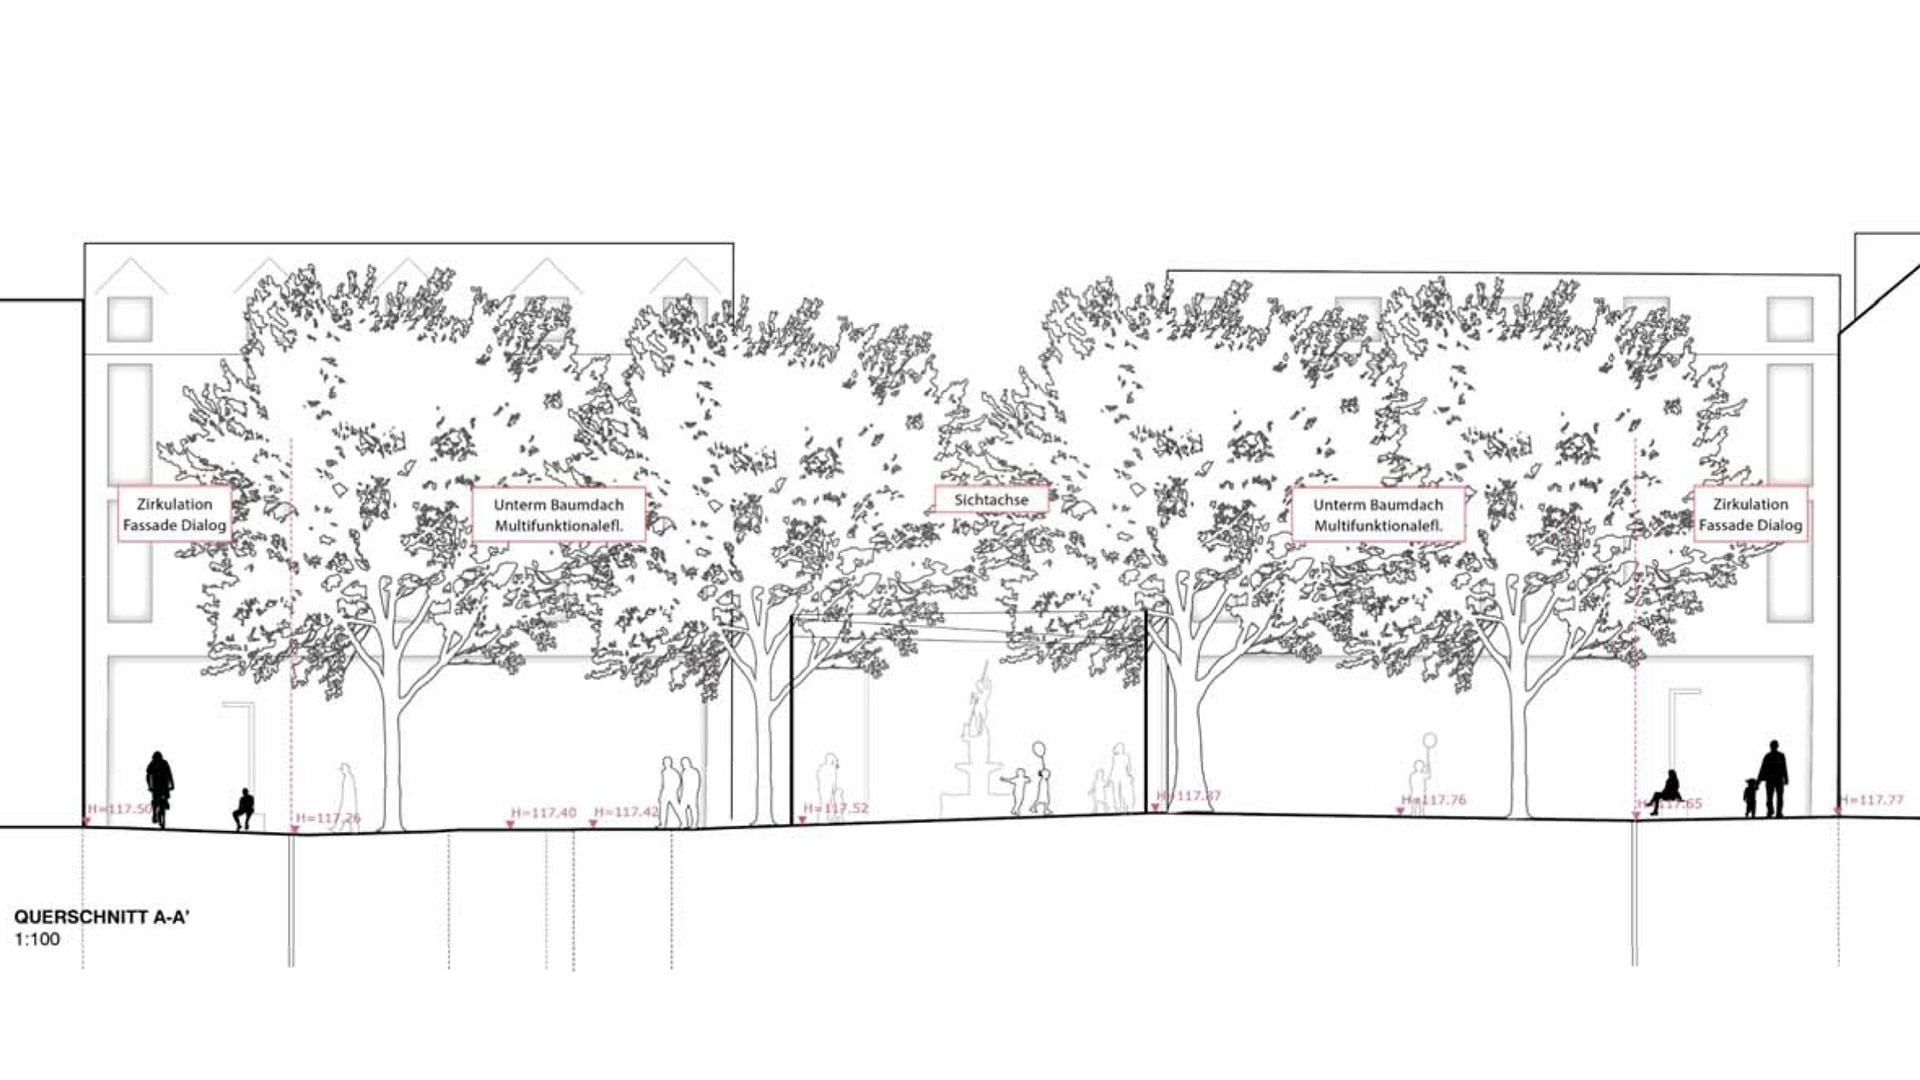 Querschnitt des Entwurfs des Planungsbüros Romboll Studio Dreiseitl. Grafik: Ramboll Studio Dreiseitl. © Stadt Limburg